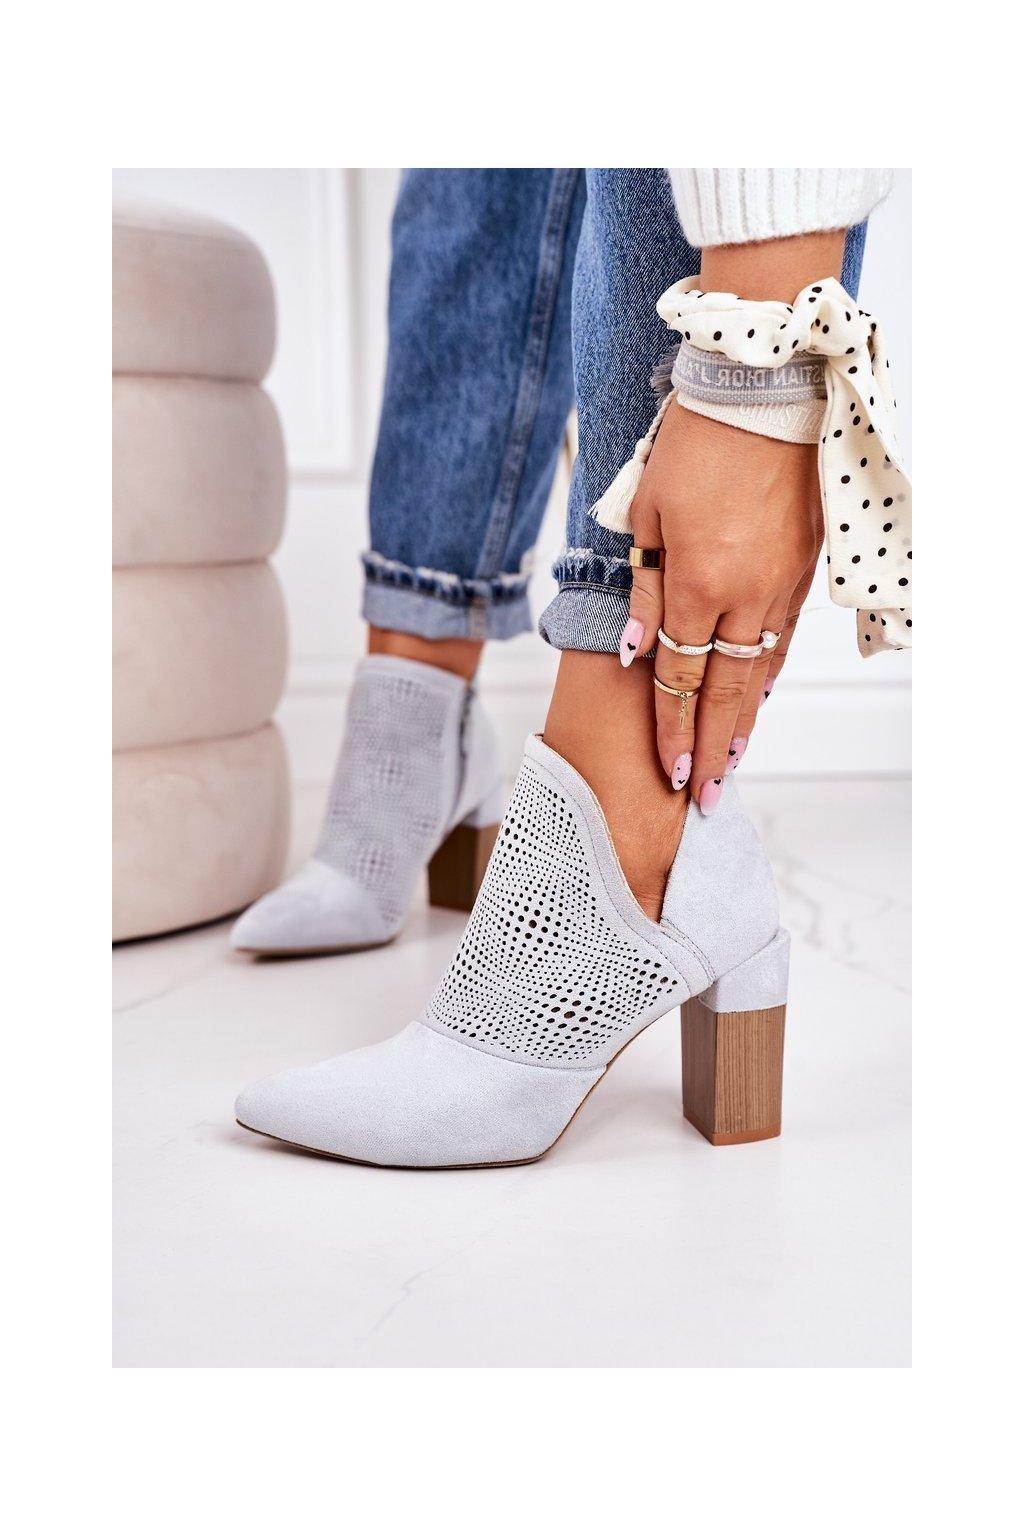 Členkové topánky na podpätku farba sivá kód obuvi A8802-6 LIGHT GREY